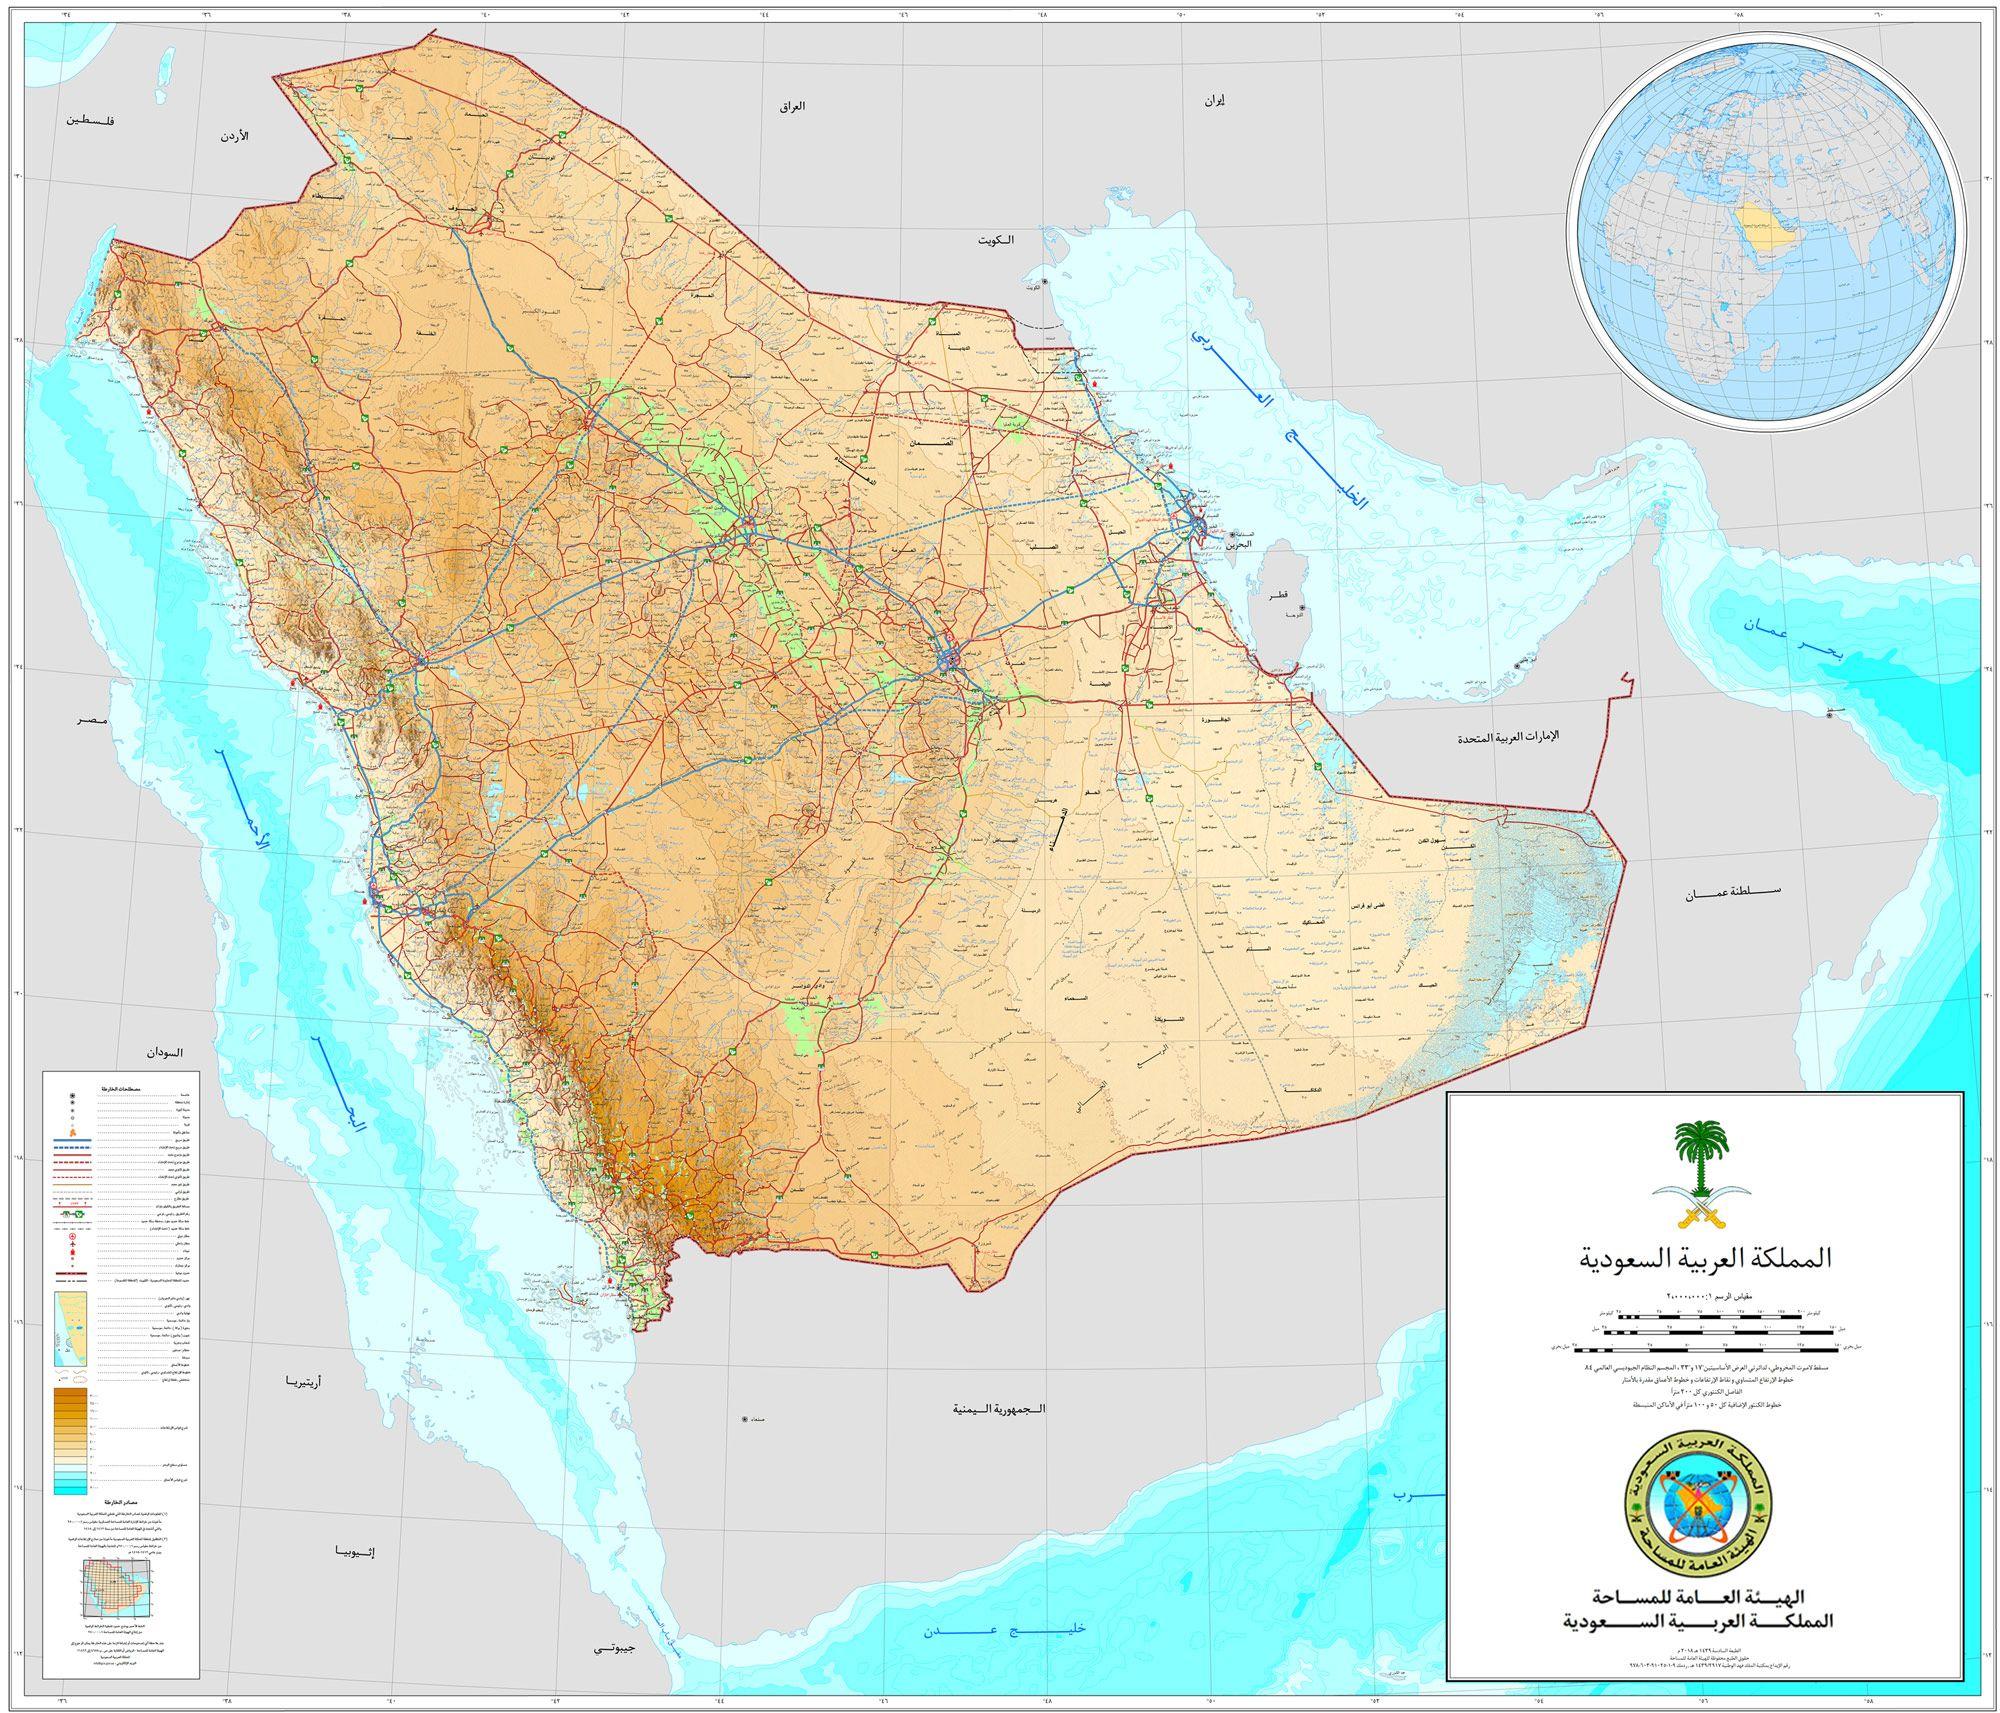 Official Map Of The Kingdom Of Saudi Arabia Map Saudi Arabia Strategic Planning